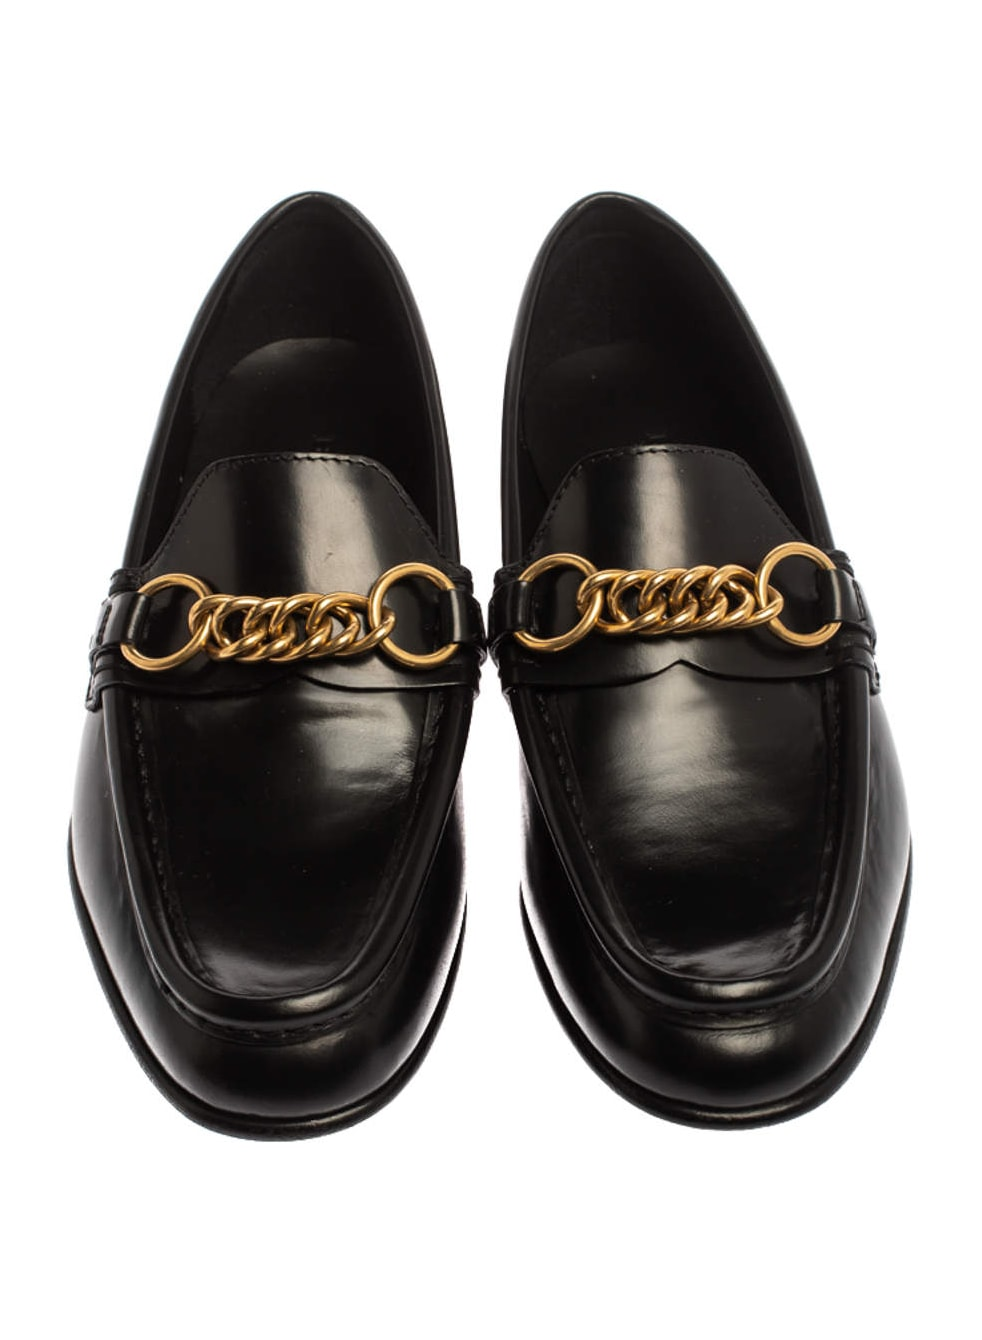 luxury-men-burberry-new-shoes-p349092-008